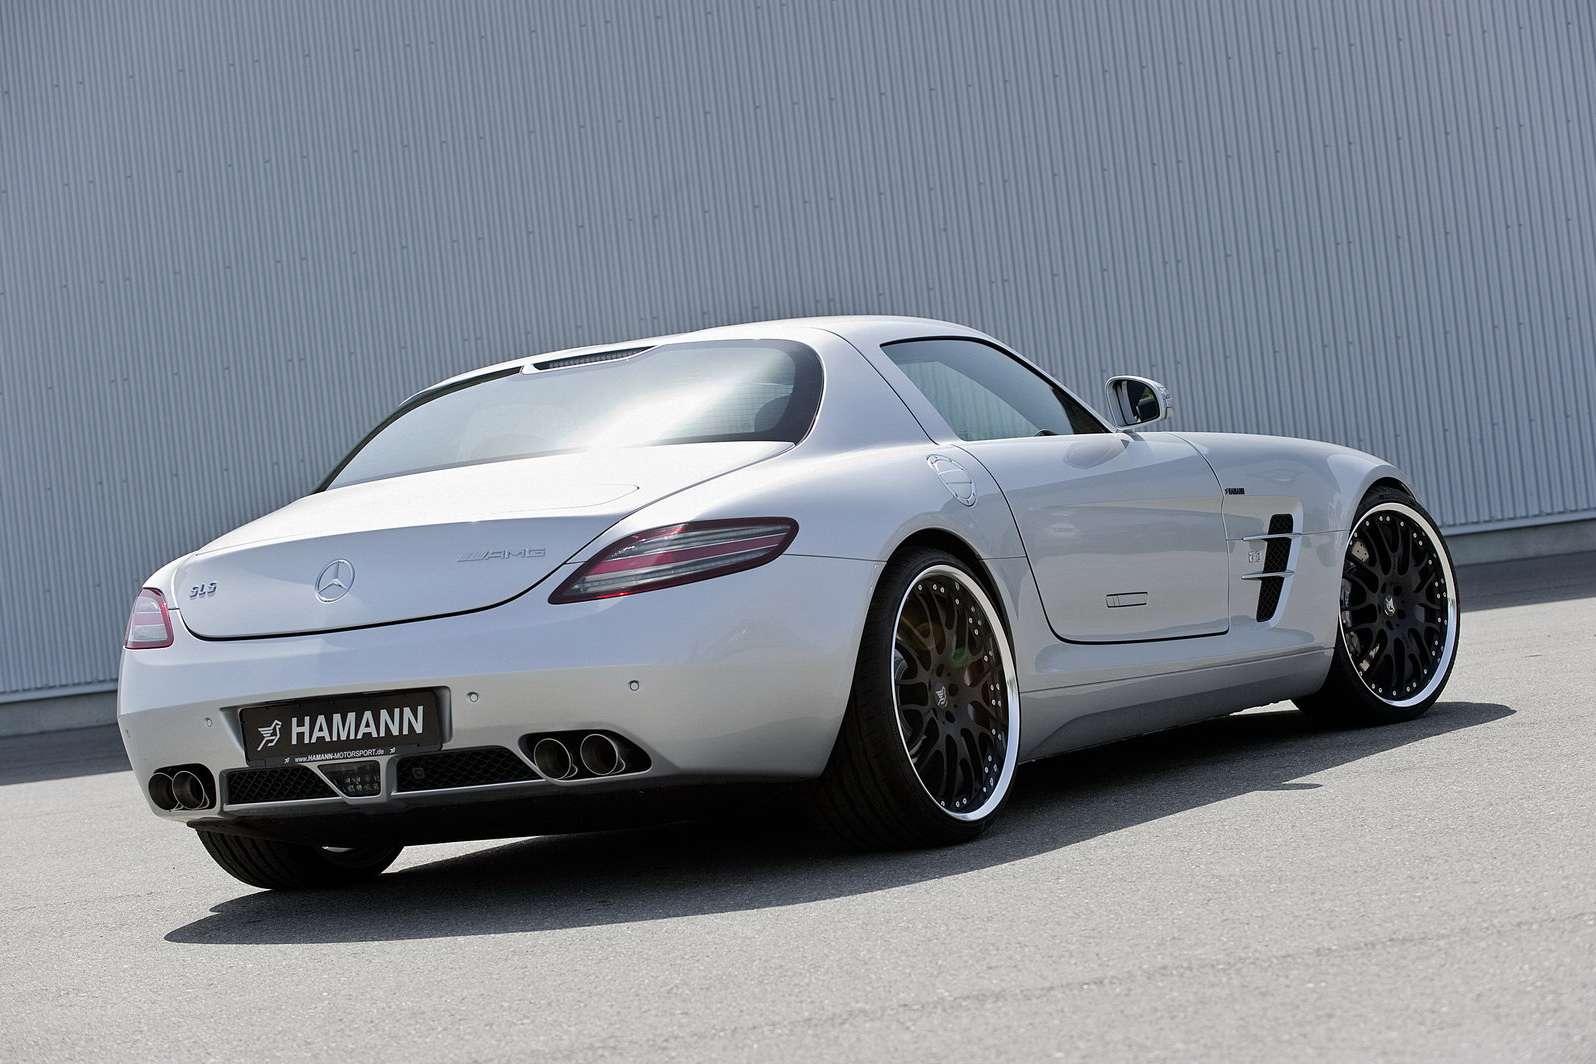 Mercedes SLS AMG Hamann lipiec 2010